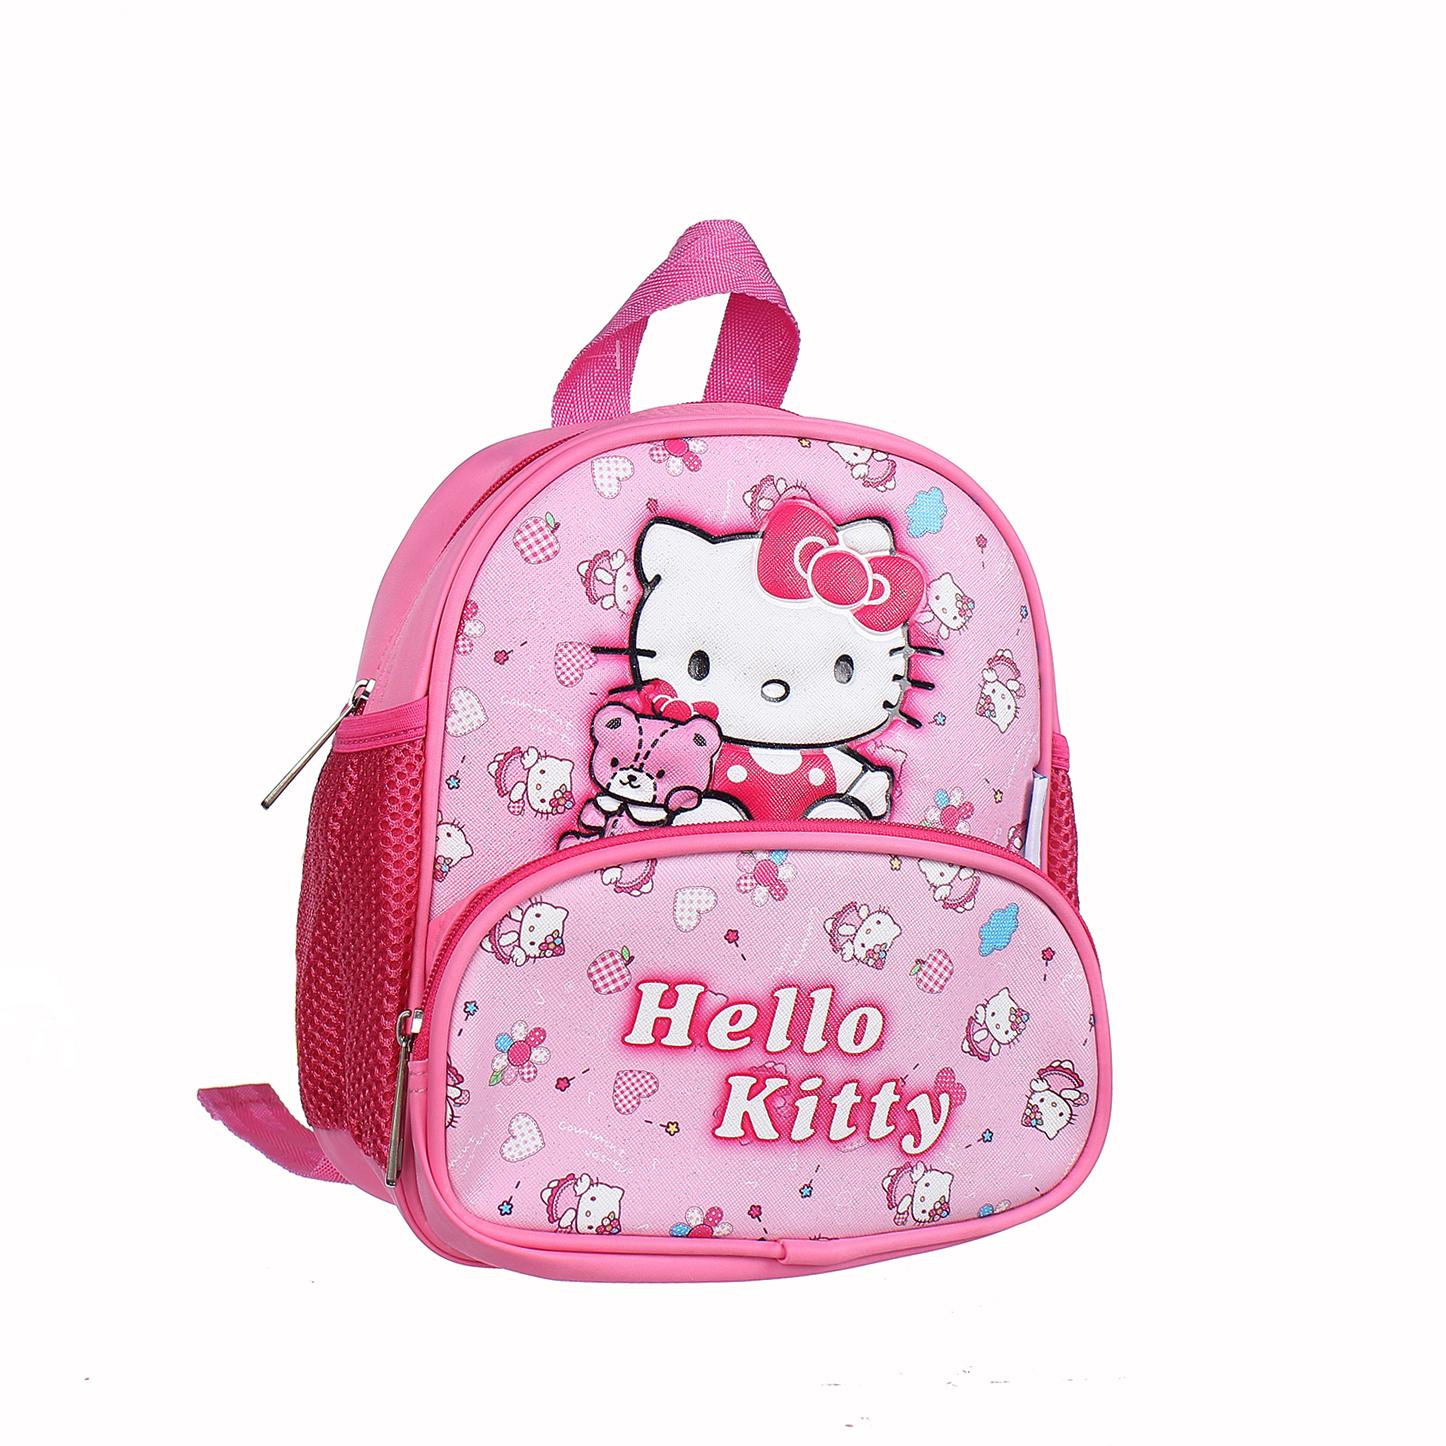 "Balo cho bé Mamago in Hello Kitty A9002 9"" chất liệu an toàn"